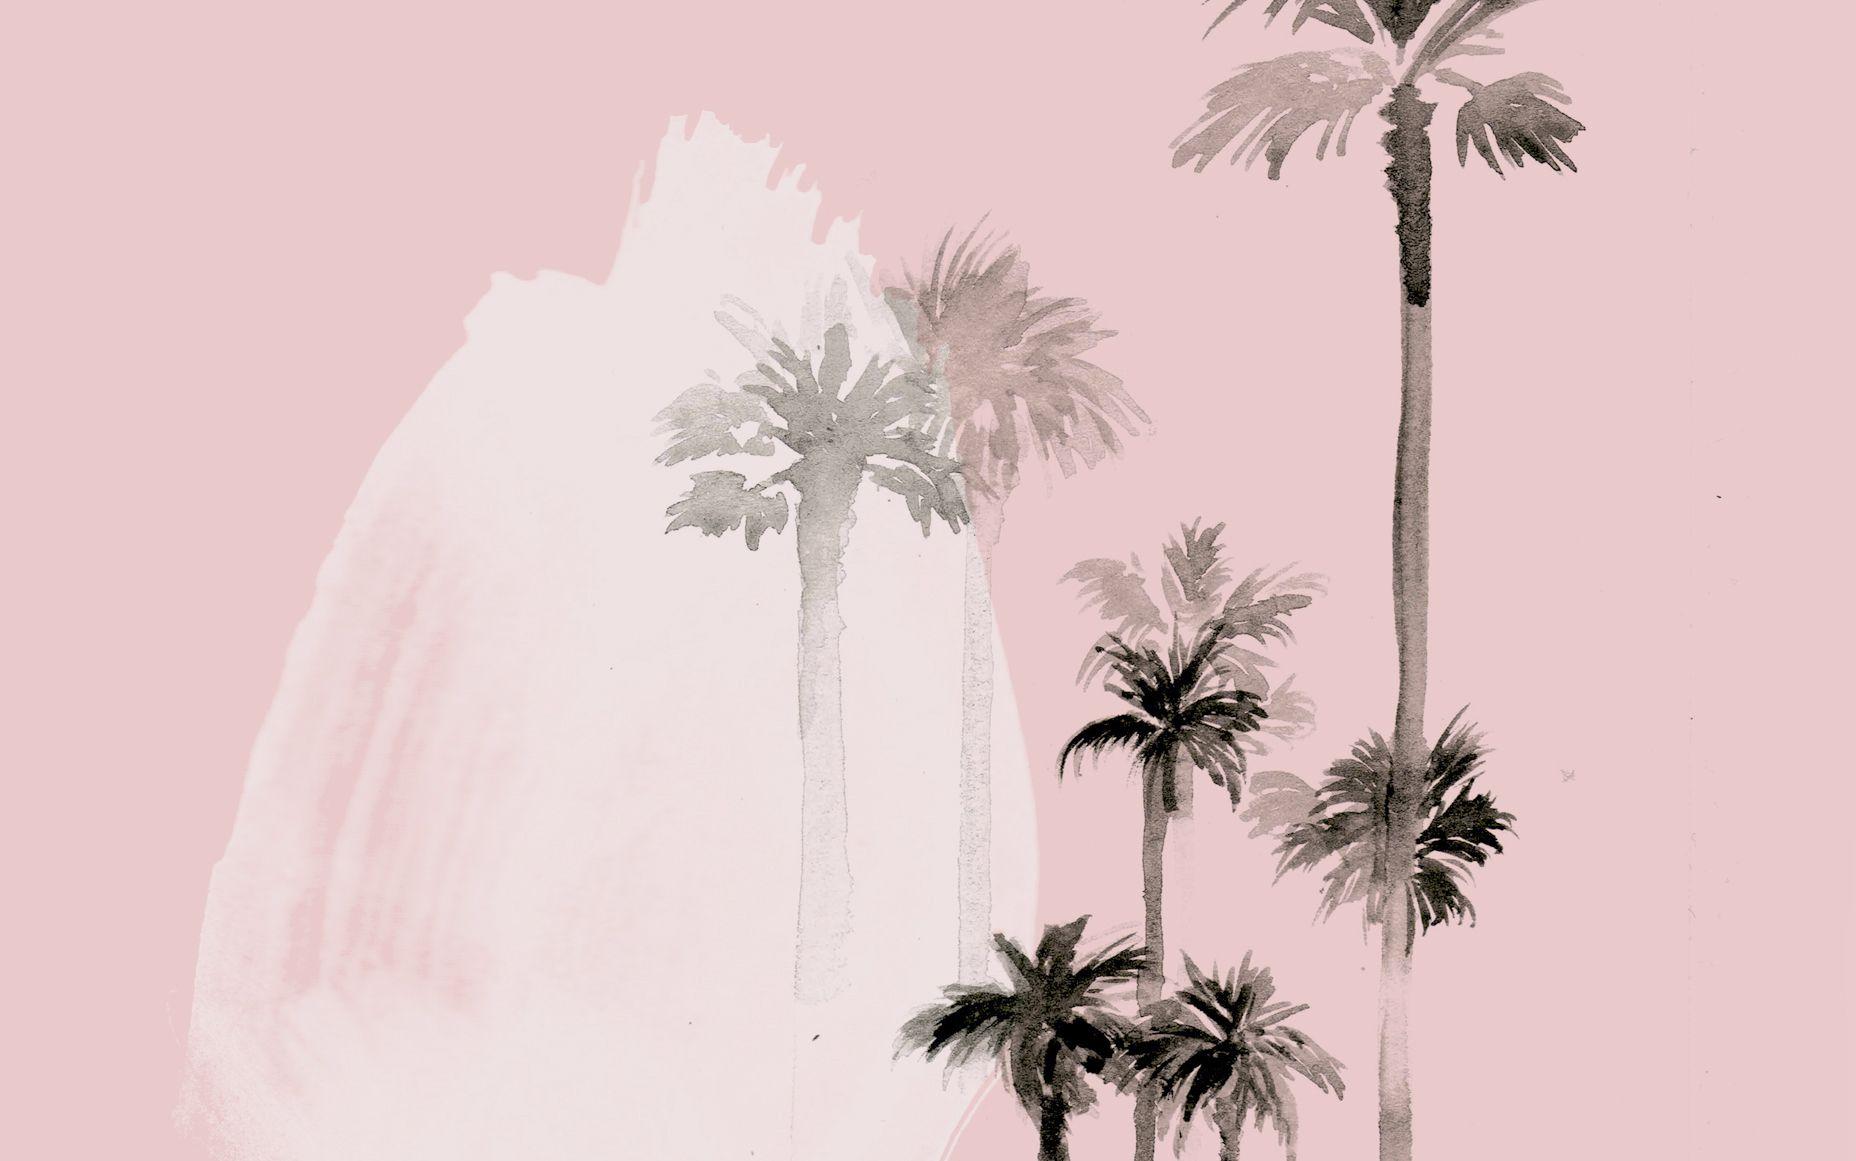 Summer Wallpapers Latar Belakang Dekorasi